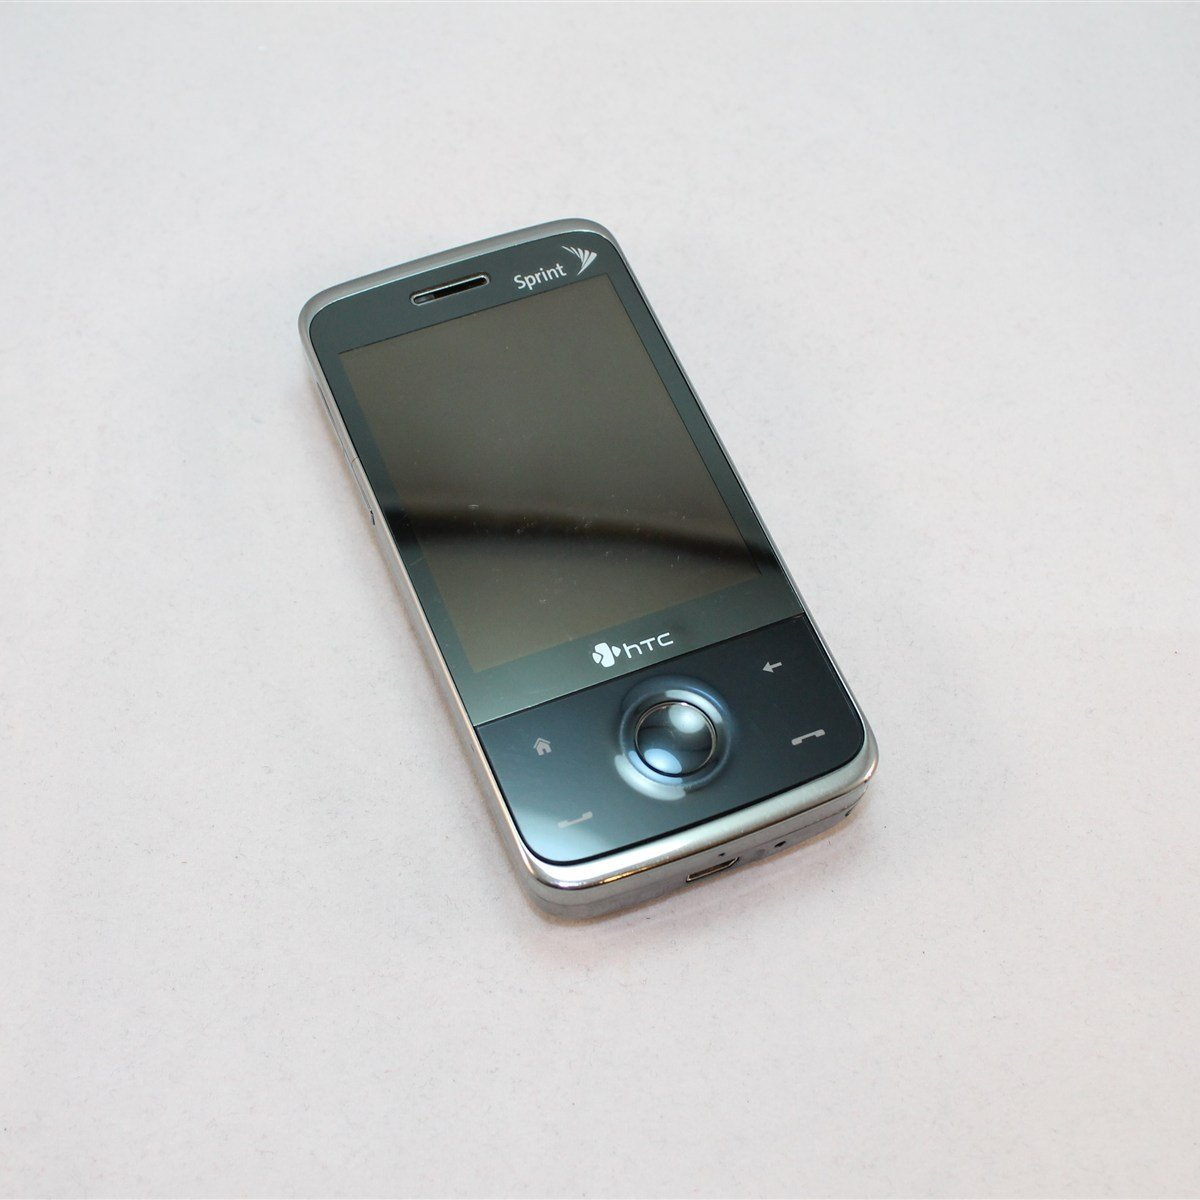 amazon com sprint htc touch pro windows smart phone cell phones